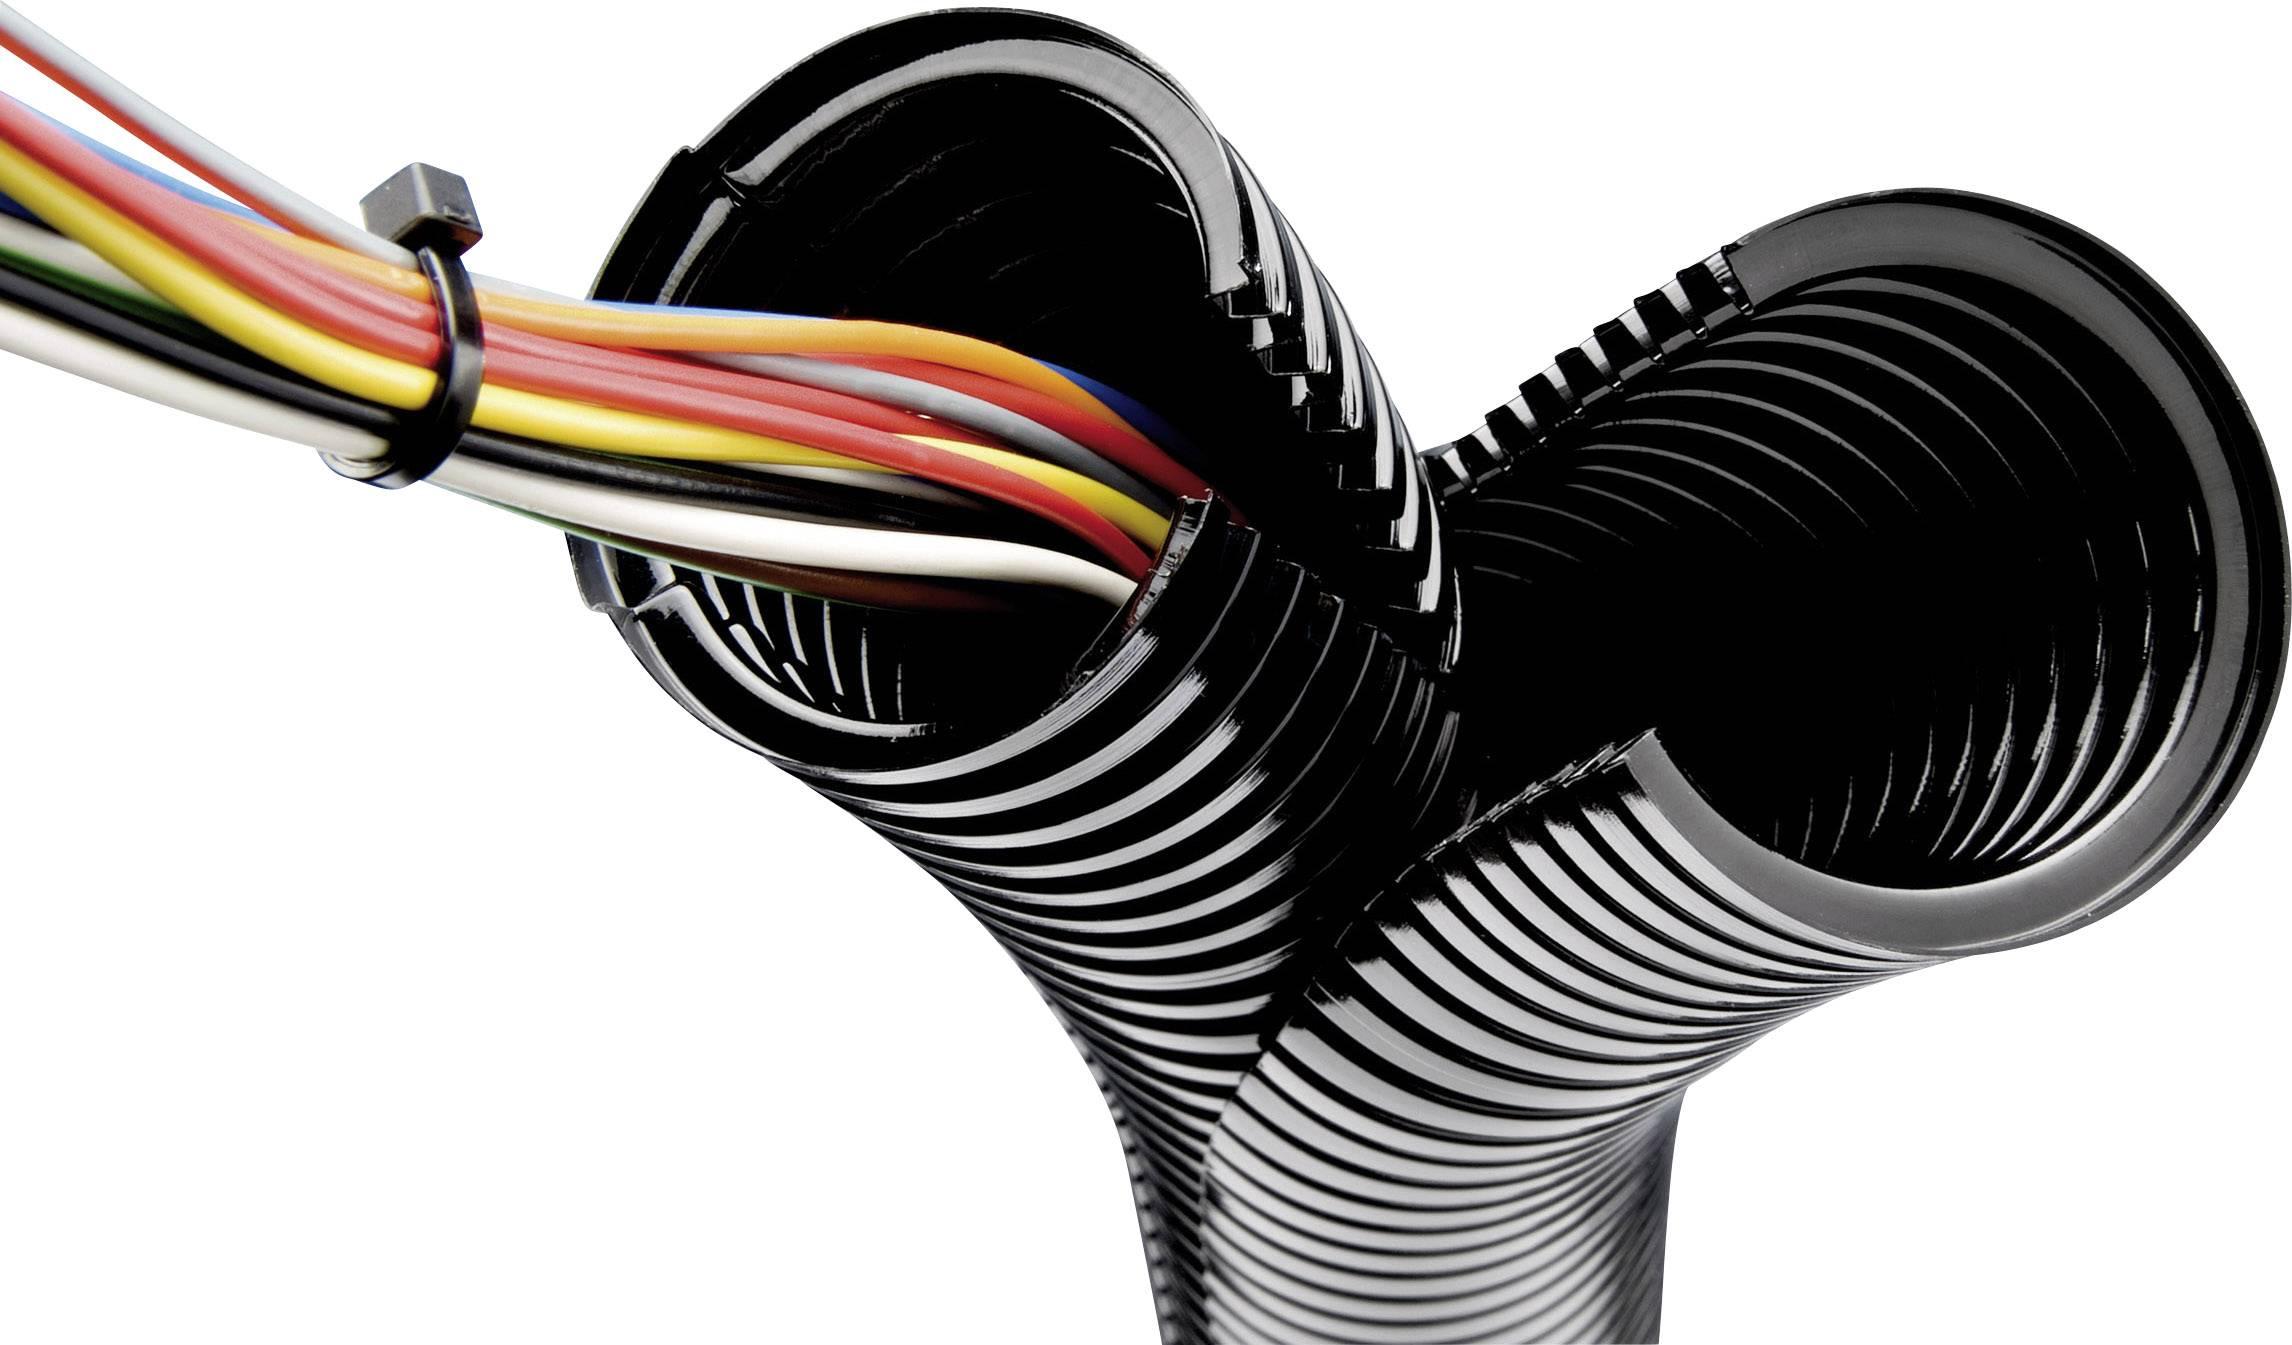 Ochranná hadica na káble LappKabel SILVYN® SPLIT 45 61806670, 43.10 mm, čierna, metrový tovar